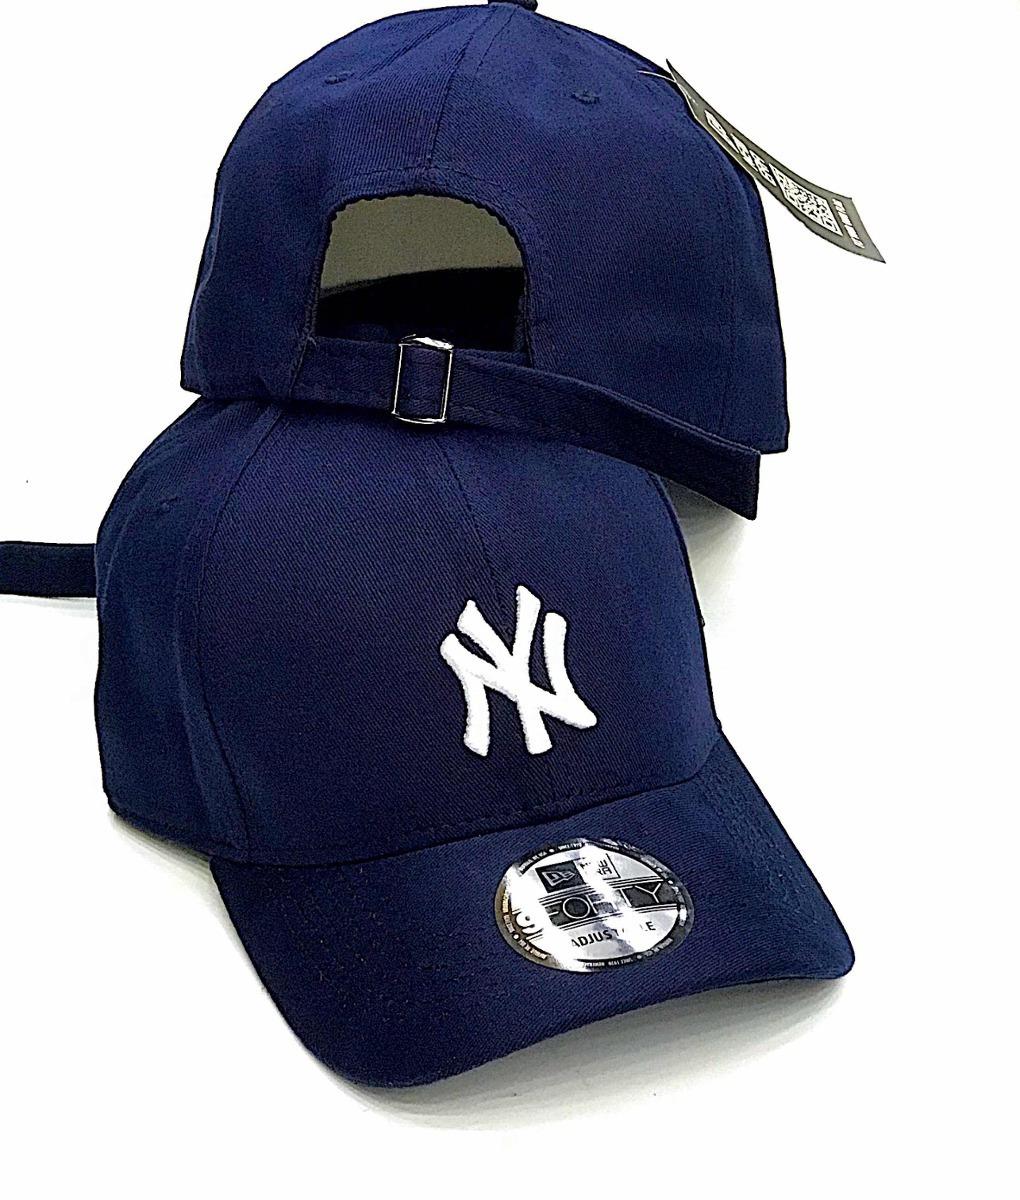 b8846558b boné new york brand pro navy ny azul escuro aba curva strap. Carregando  zoom.